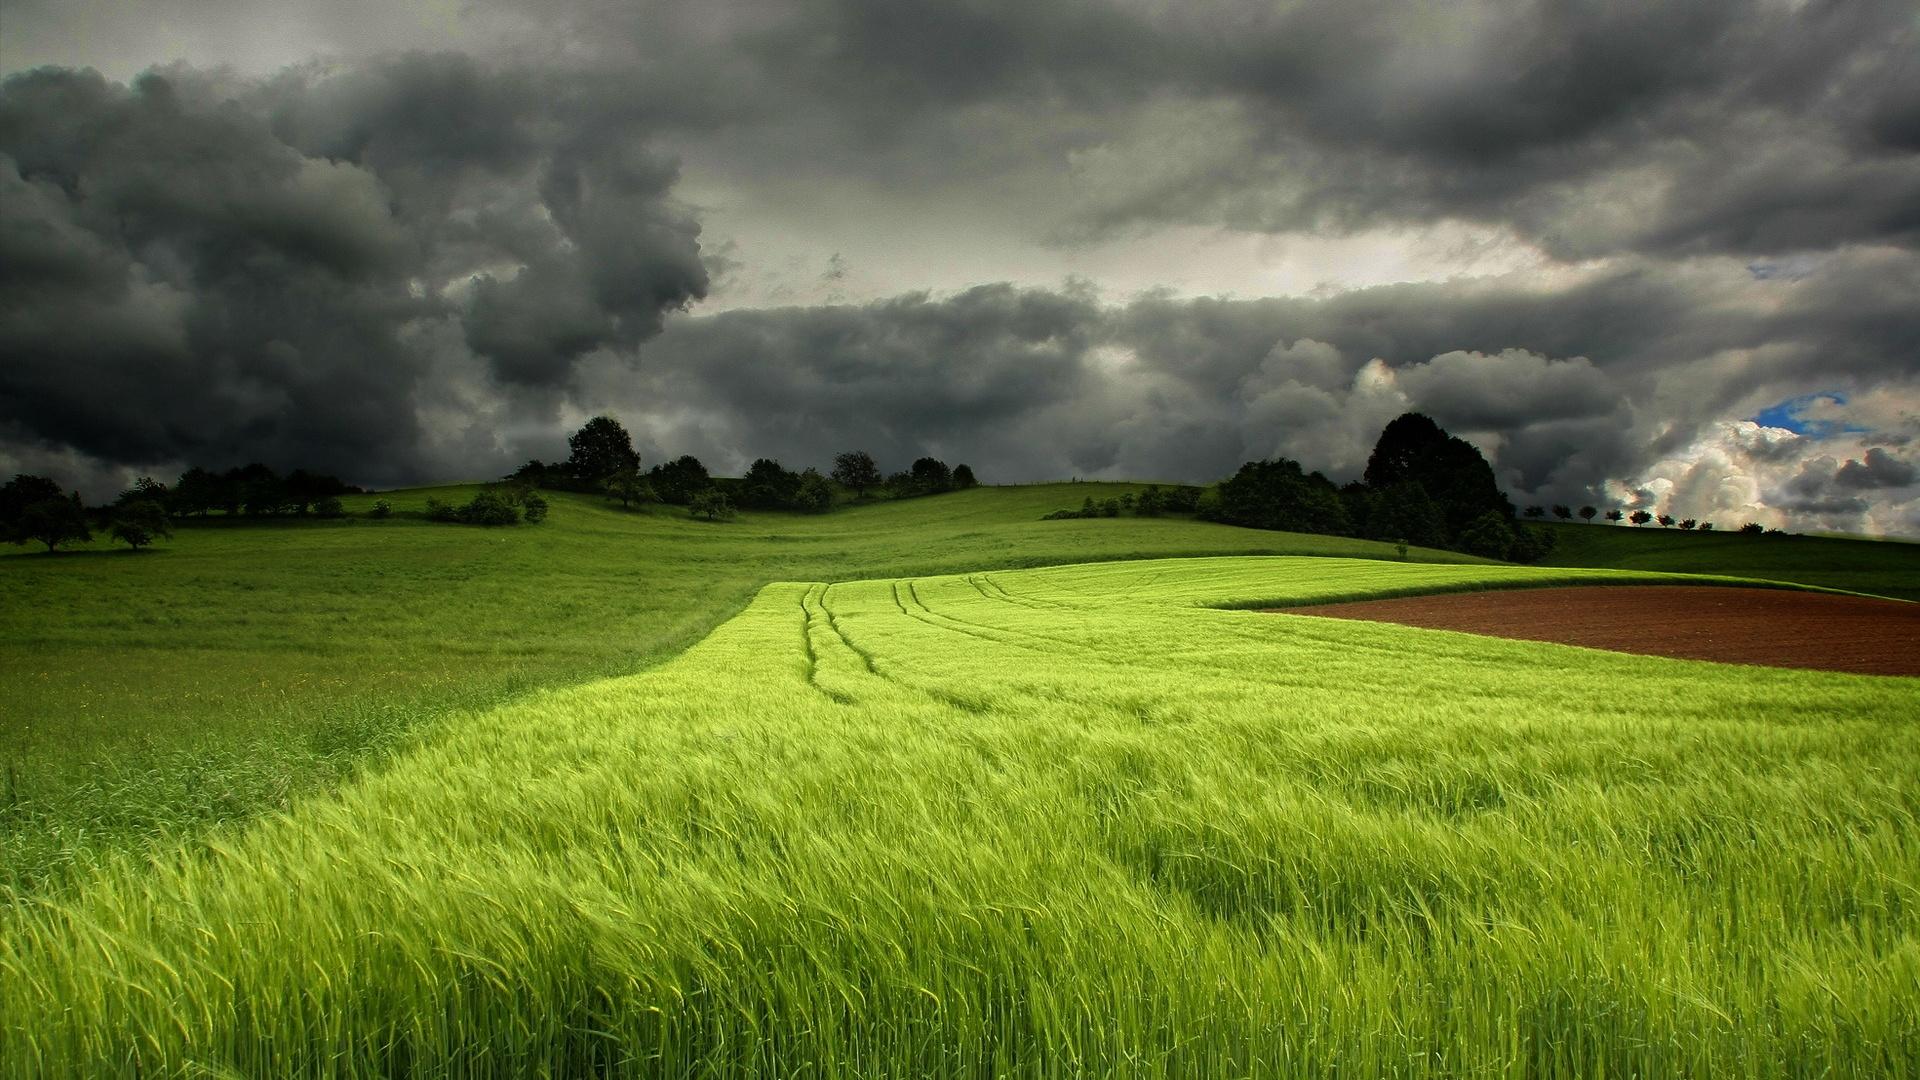 Summer green fields cloudy sky wallpaper 1920x1080 full hd resolution wallpaper download - Wallpaper pictures ...